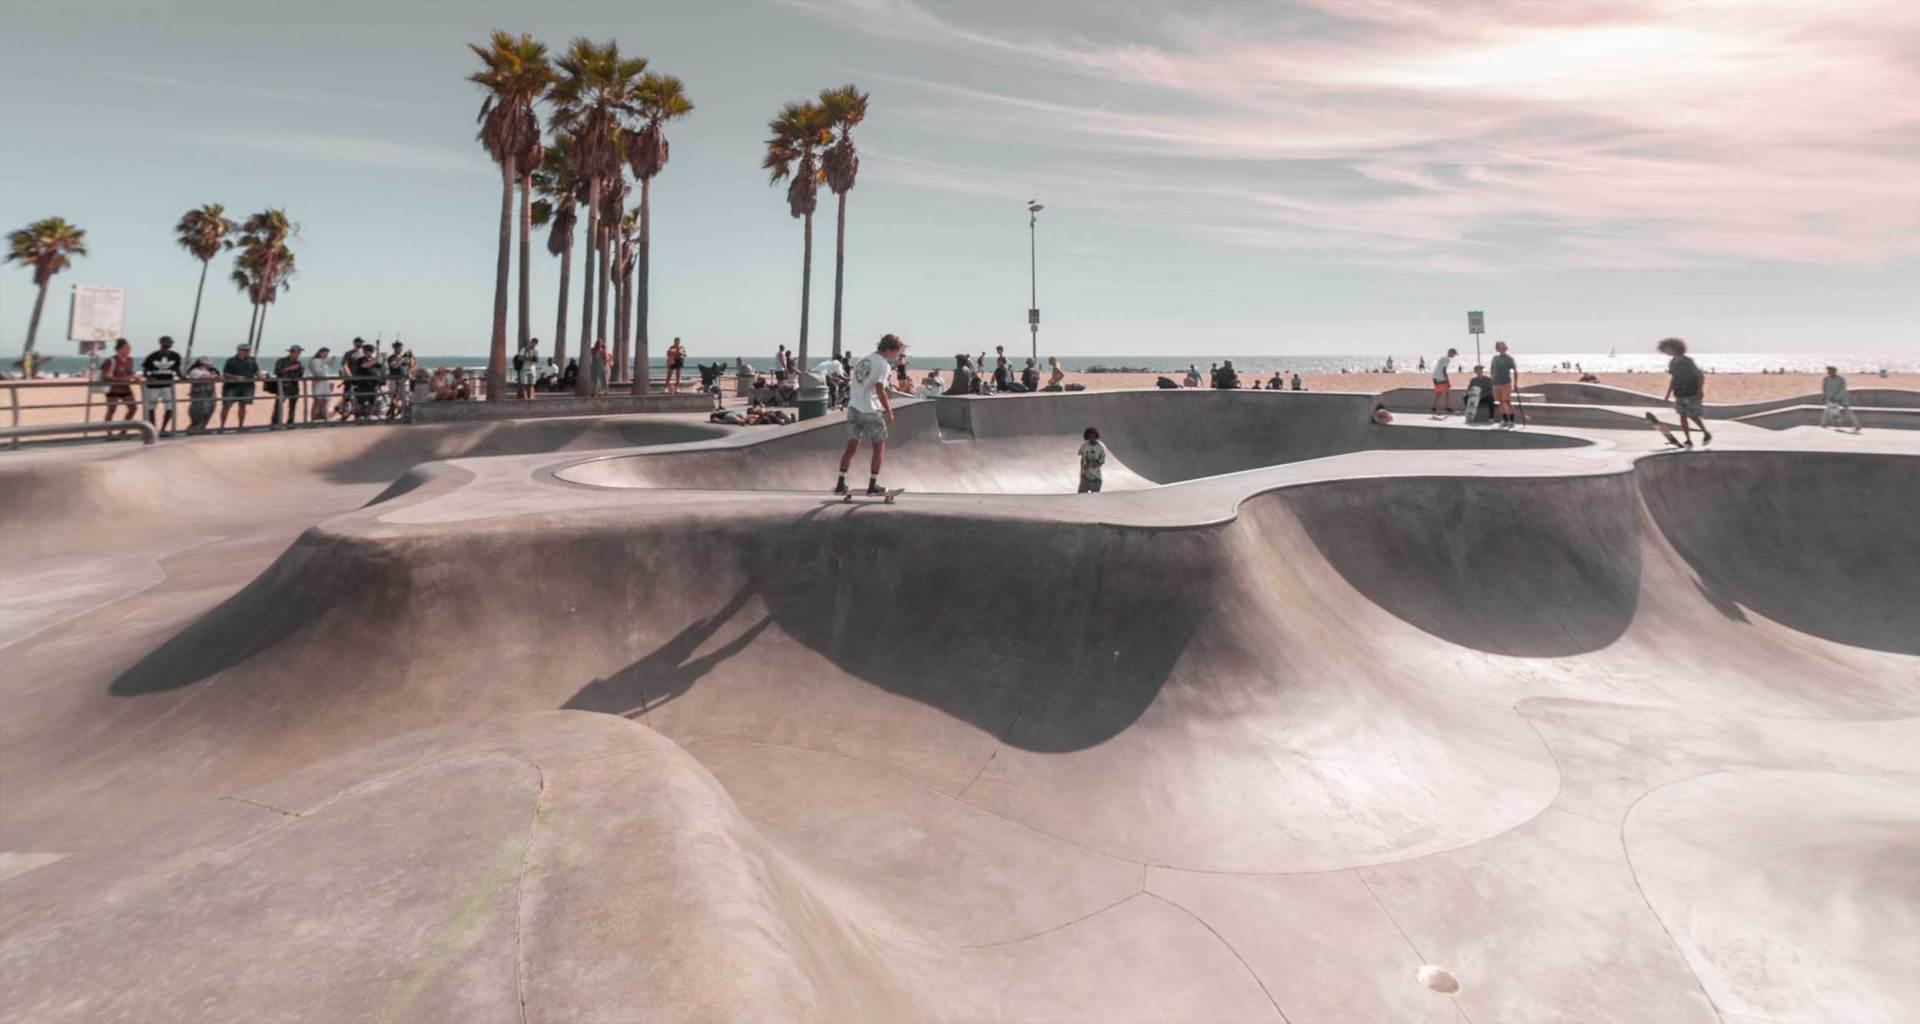 California skate park.